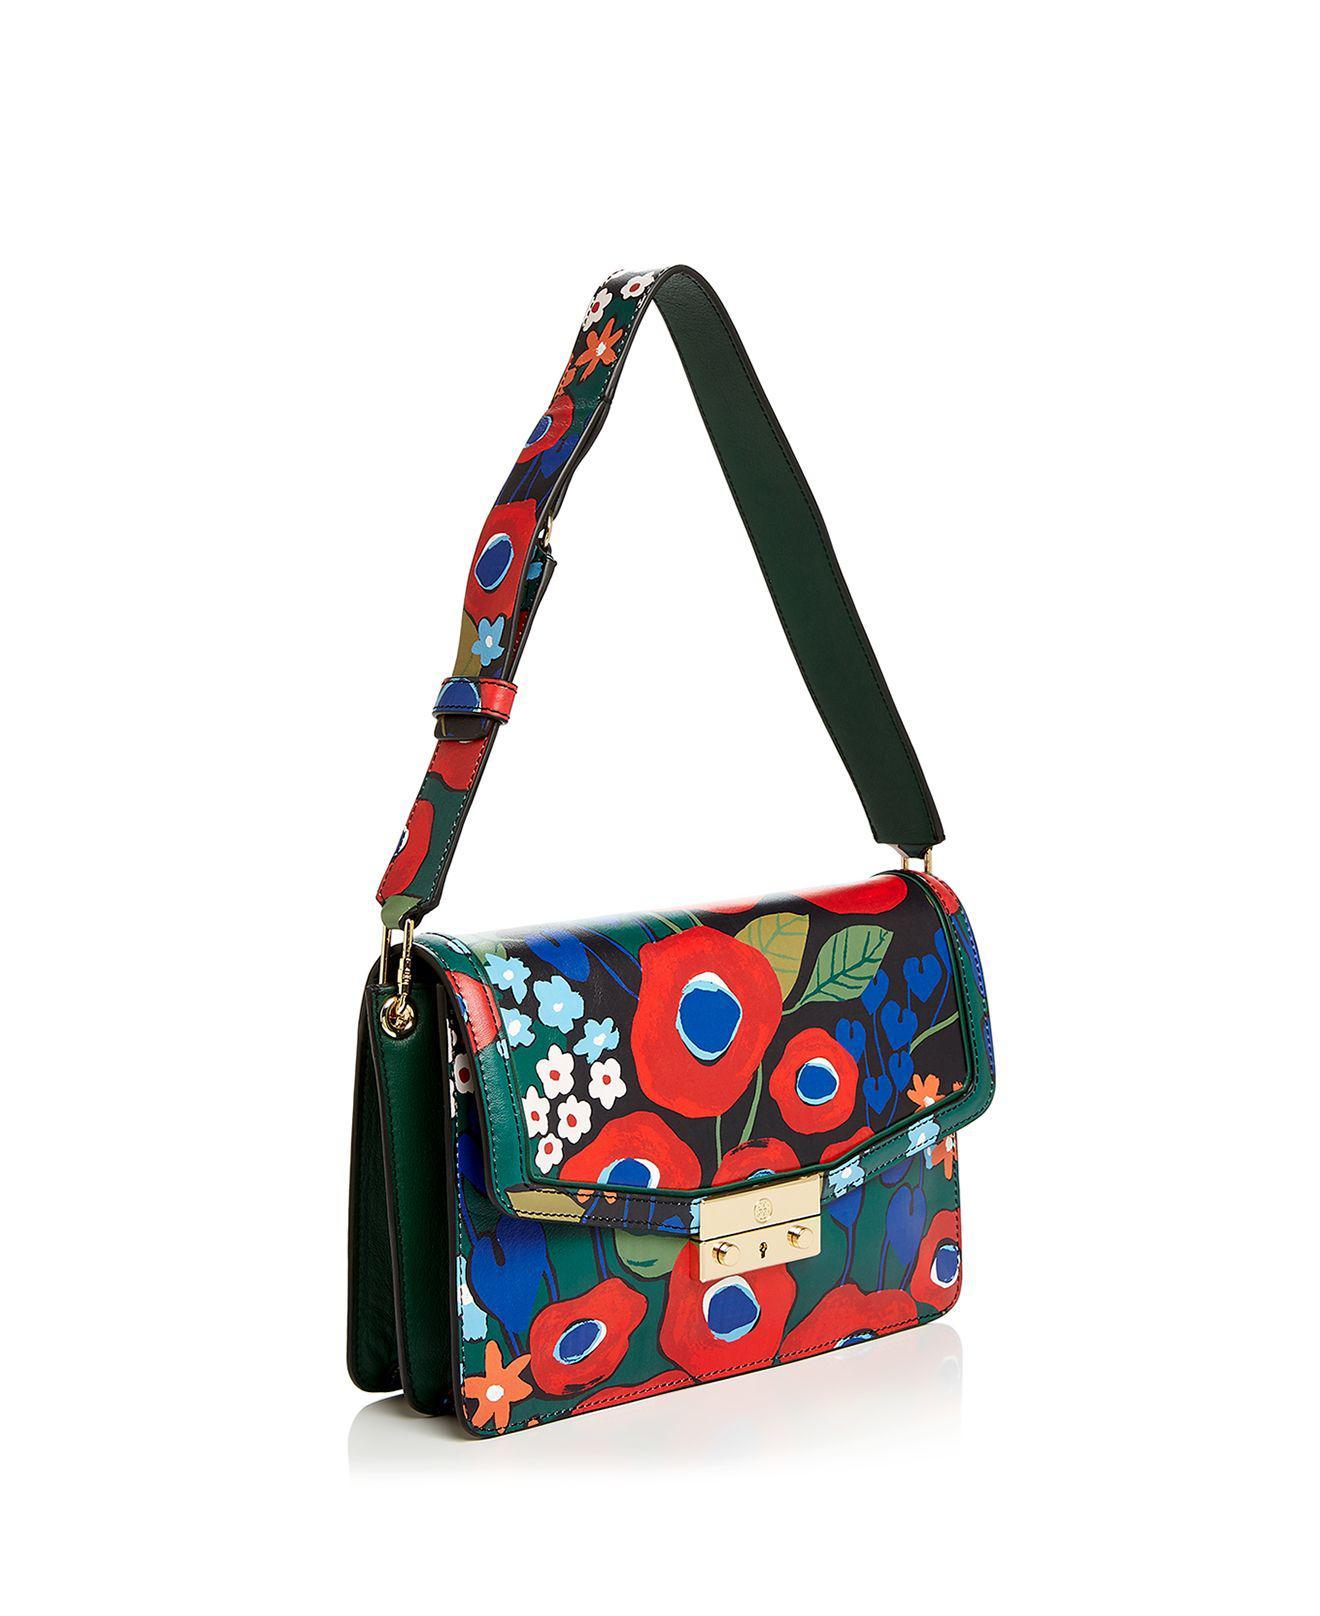 9edc7a5ec74 Lyst - Tory Burch Juliette Printed Leather Shoulder Bag